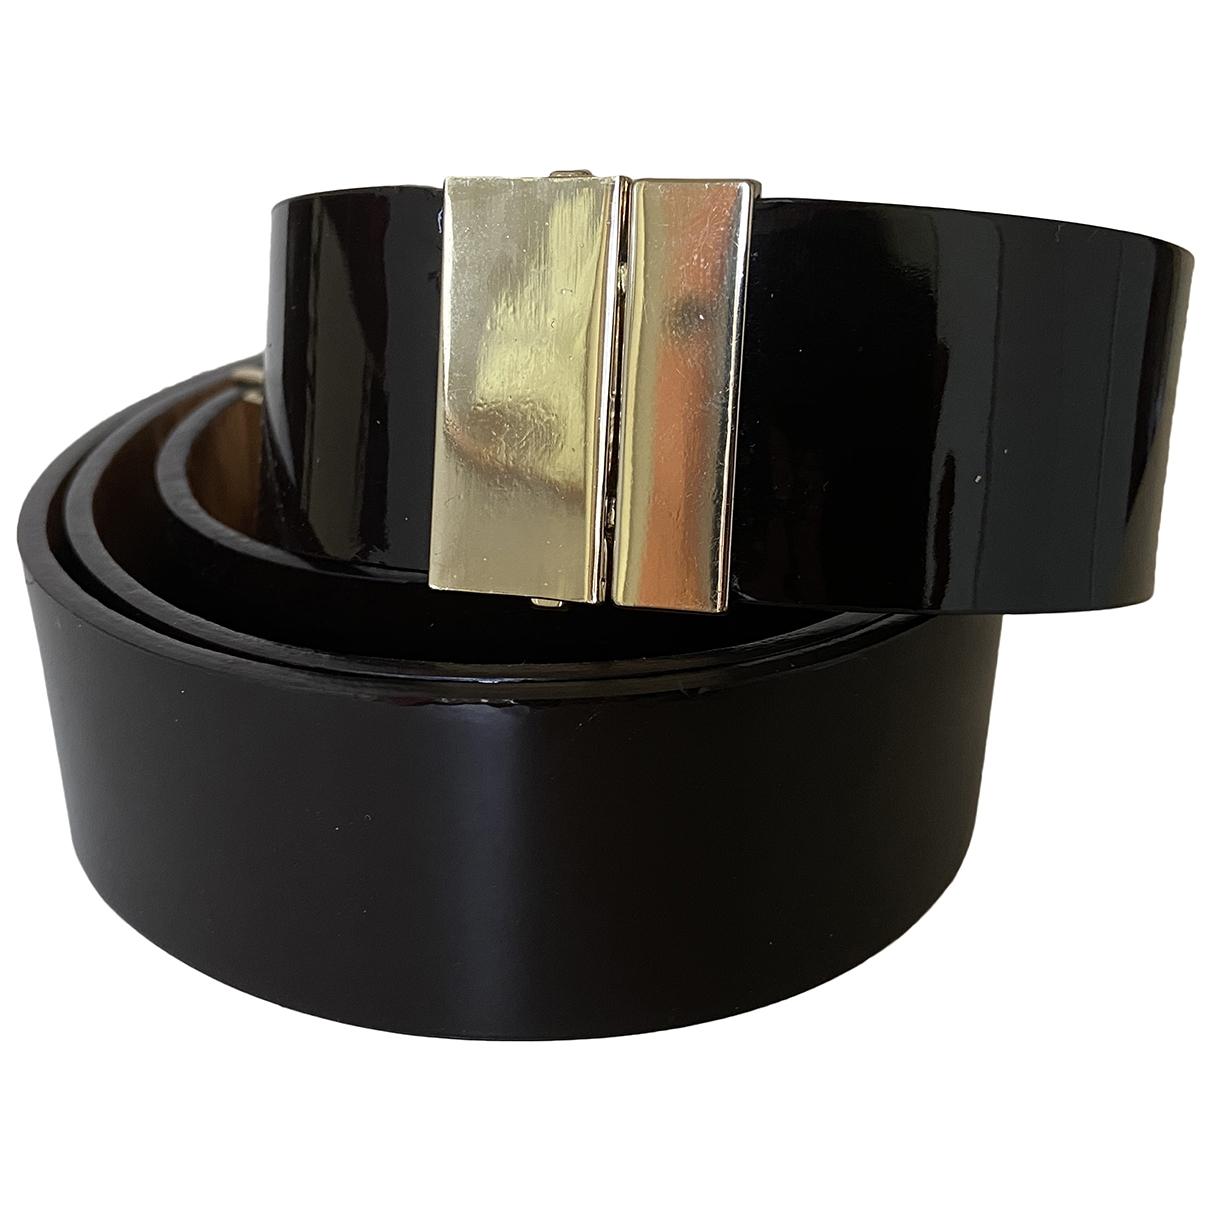 Hoss Intropia \N Brown Patent leather belt for Women M International